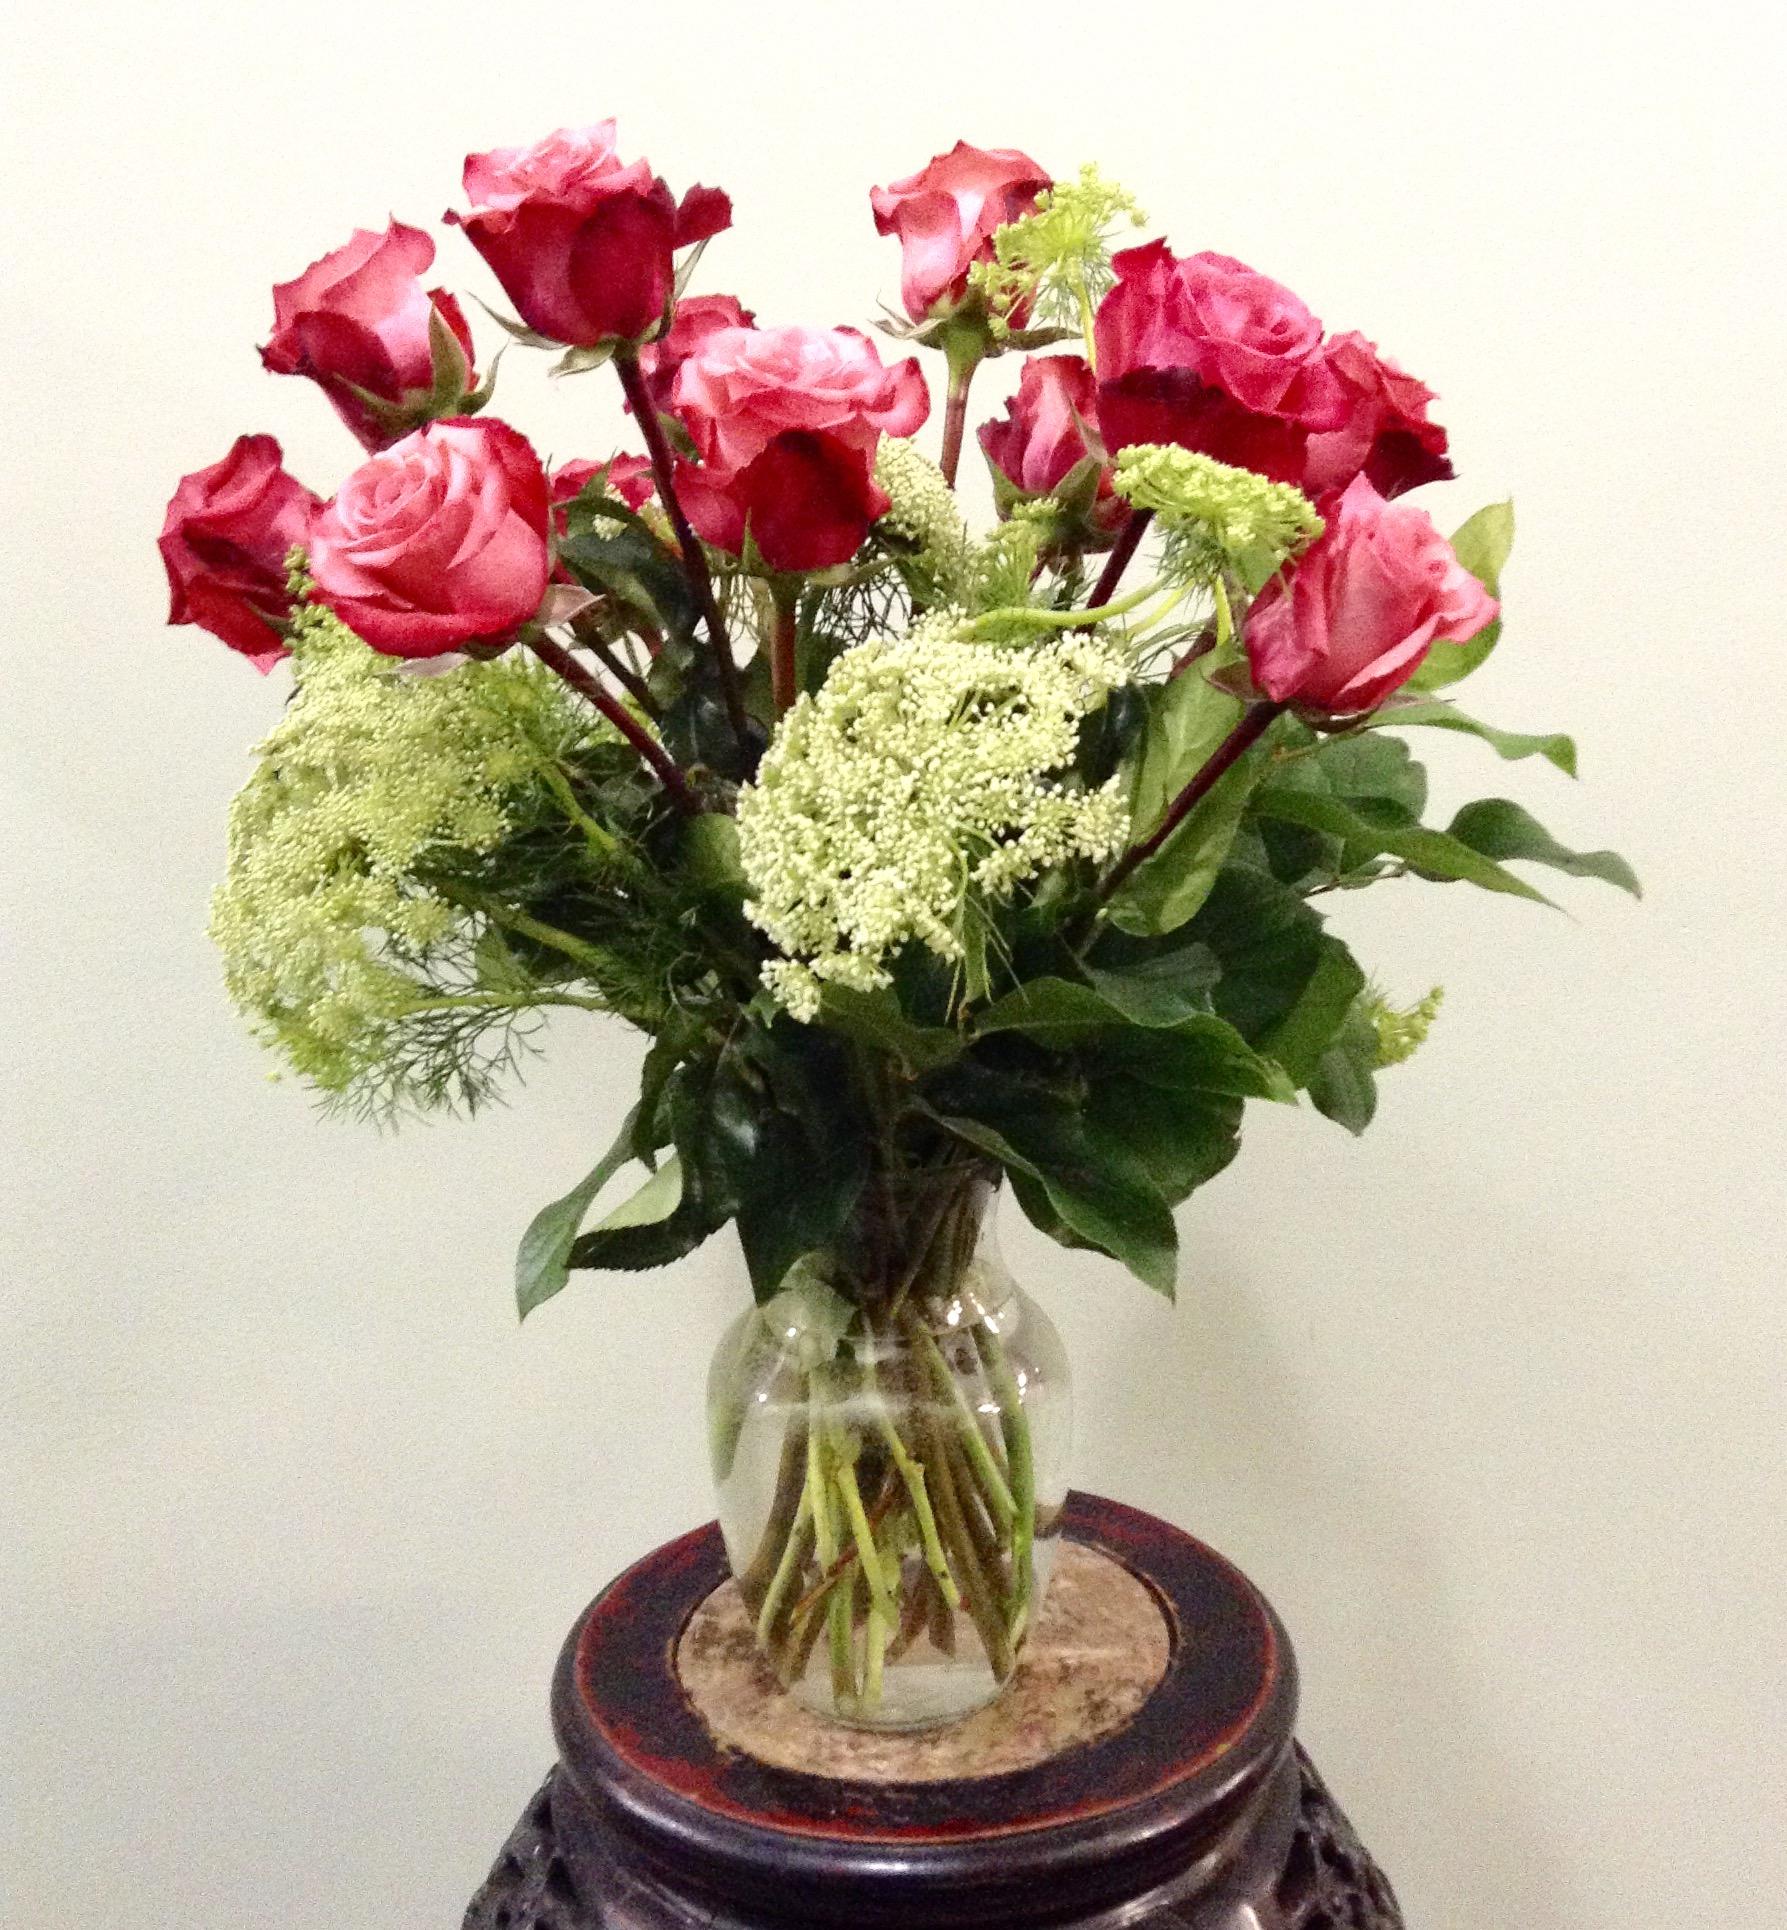 NYC Local Florist Shop